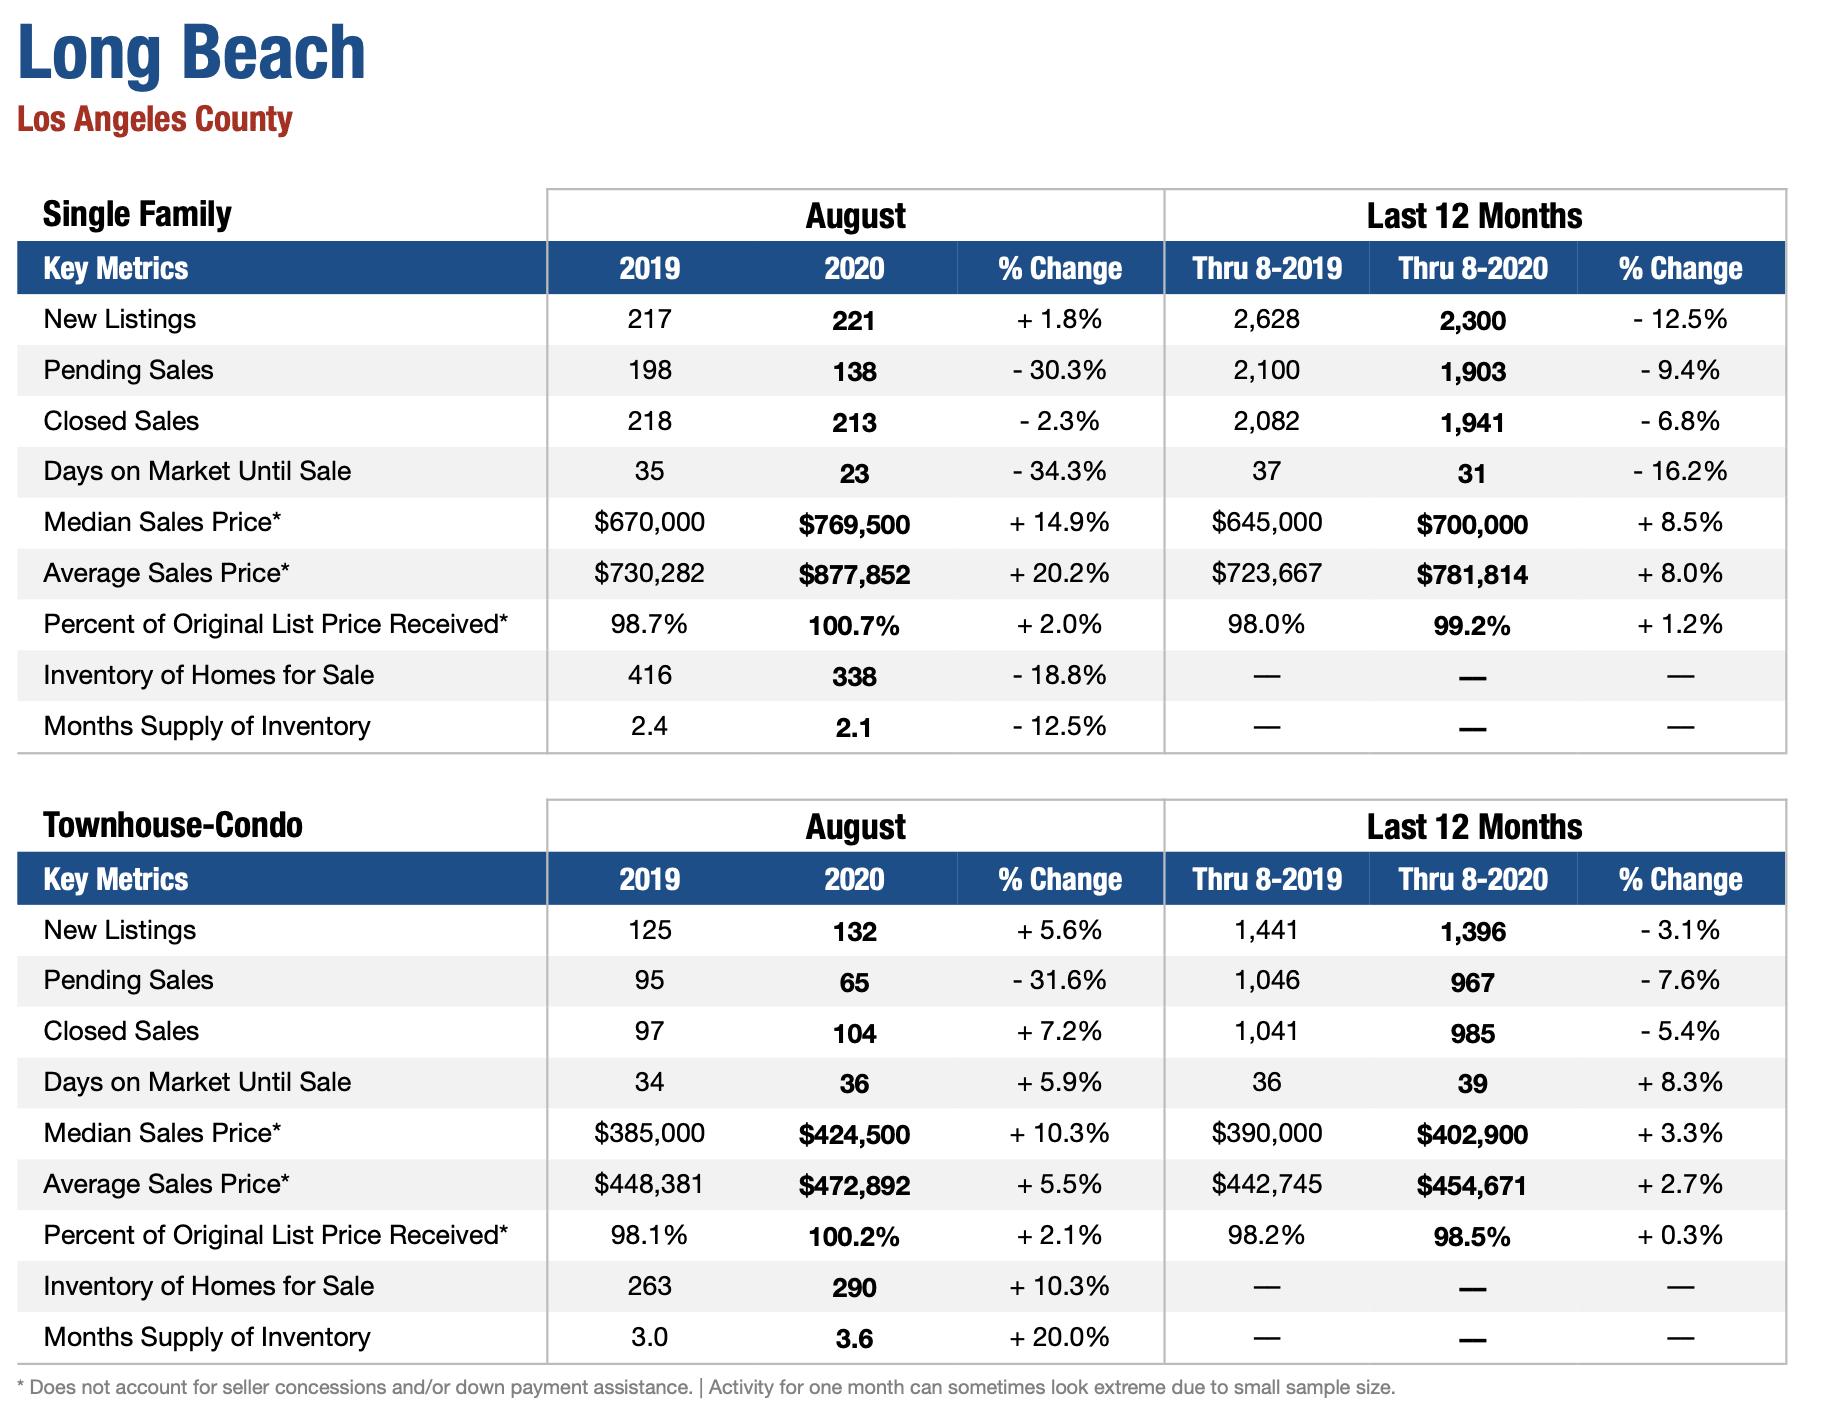 Long Beach Real Estate Market August 2020